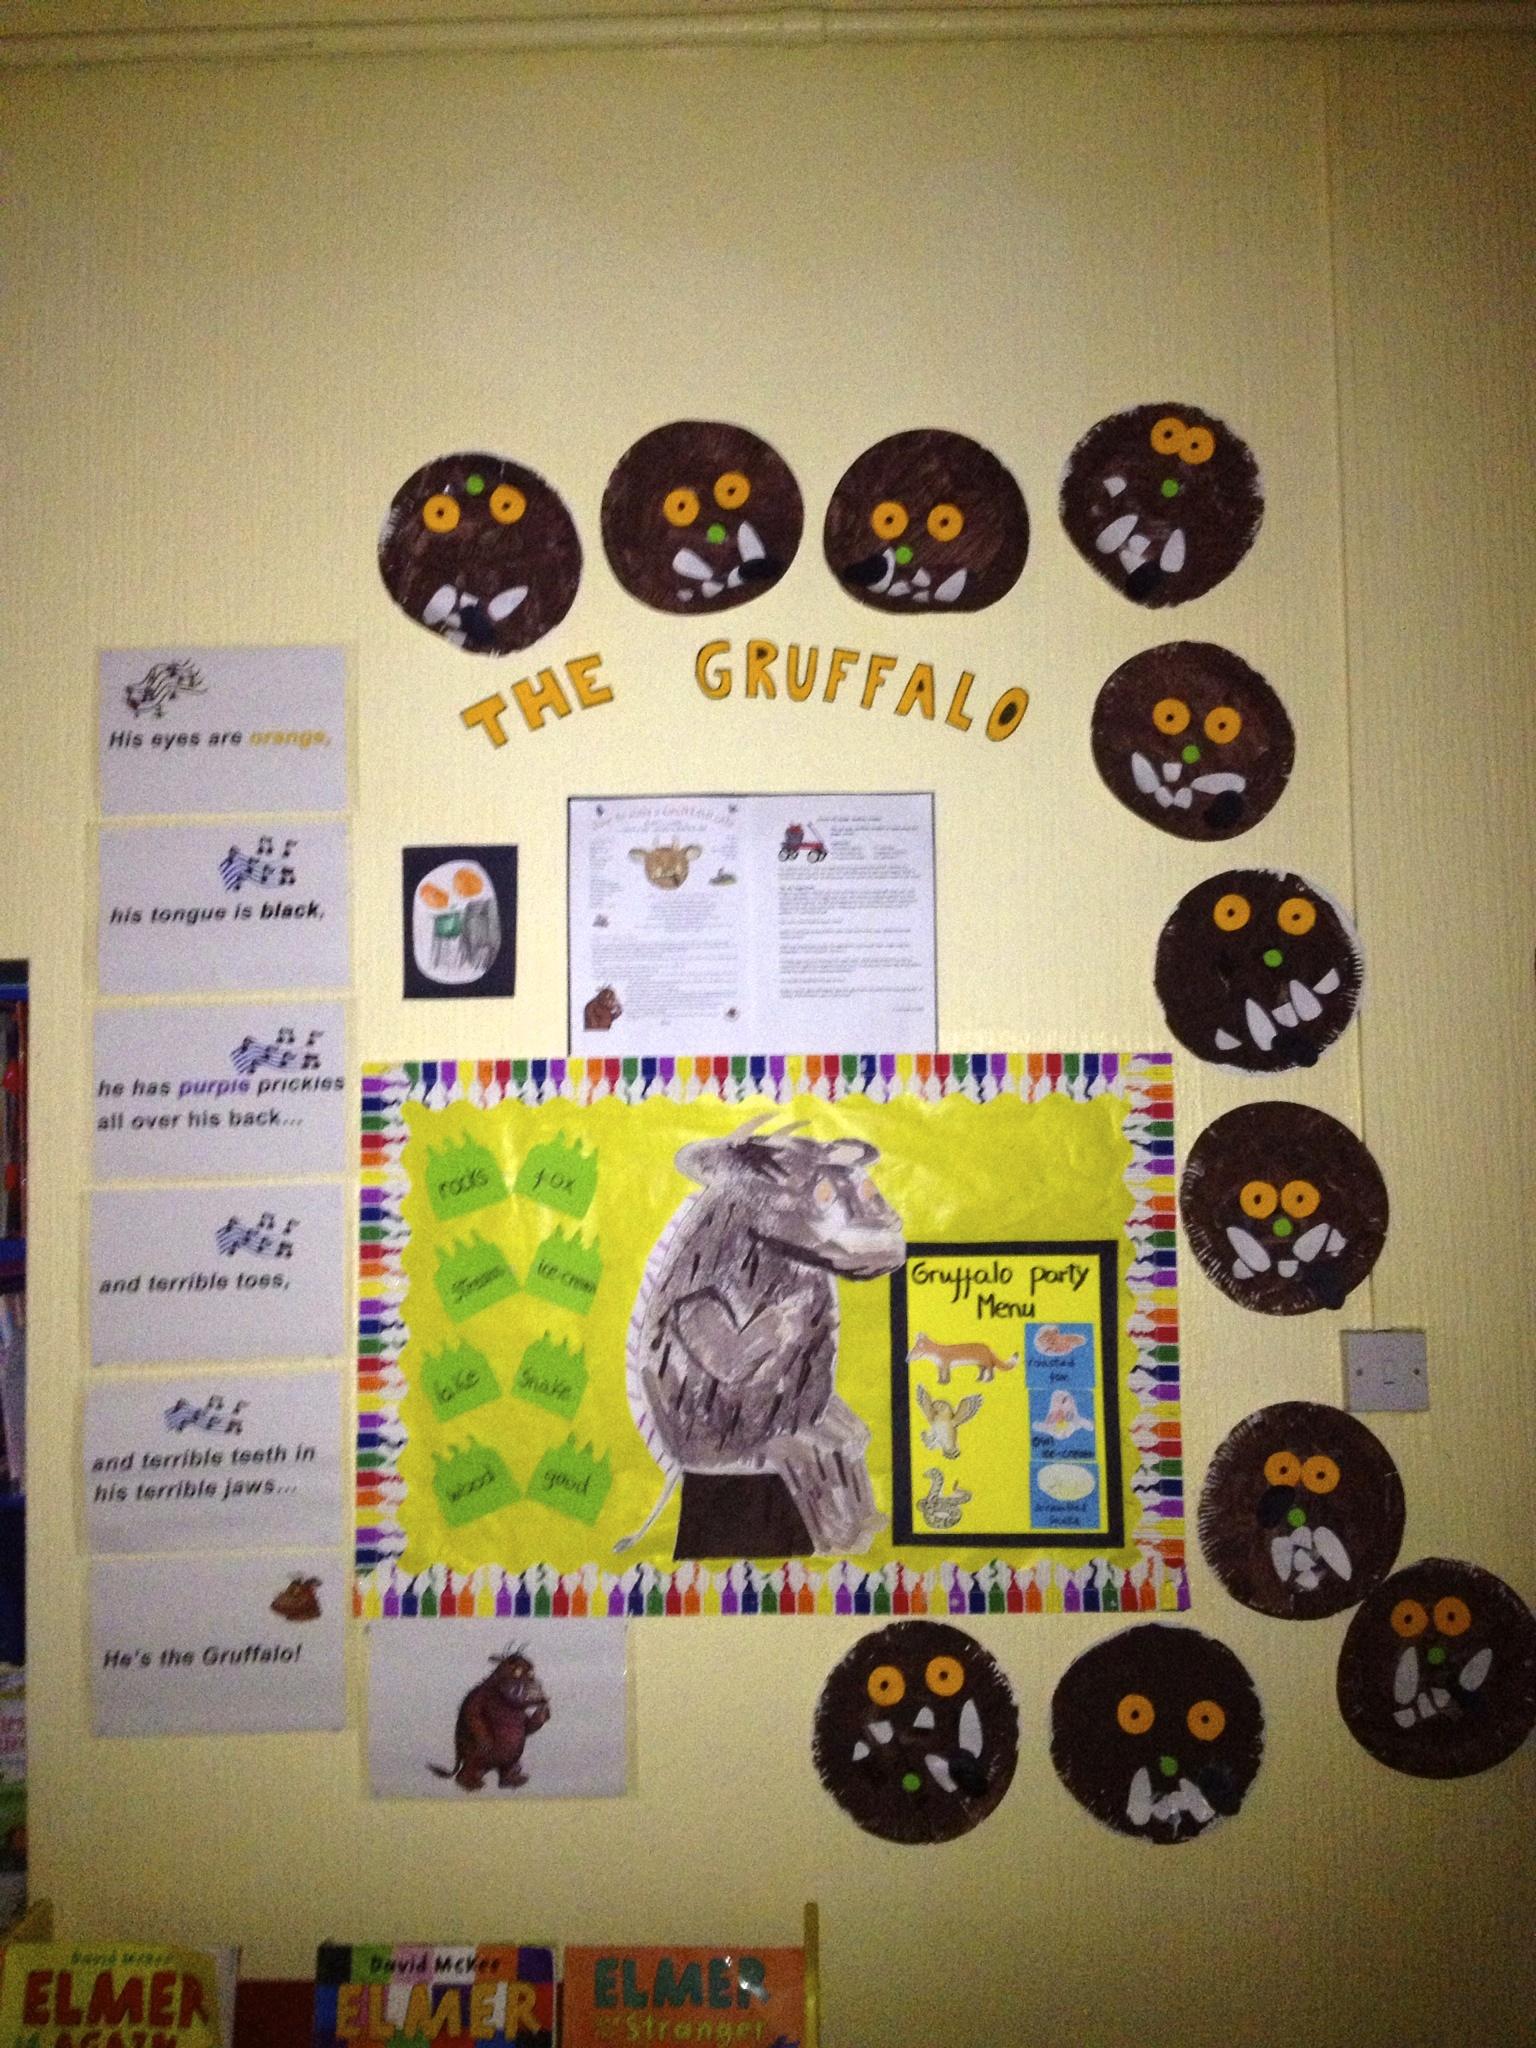 Gruffalo Party Display